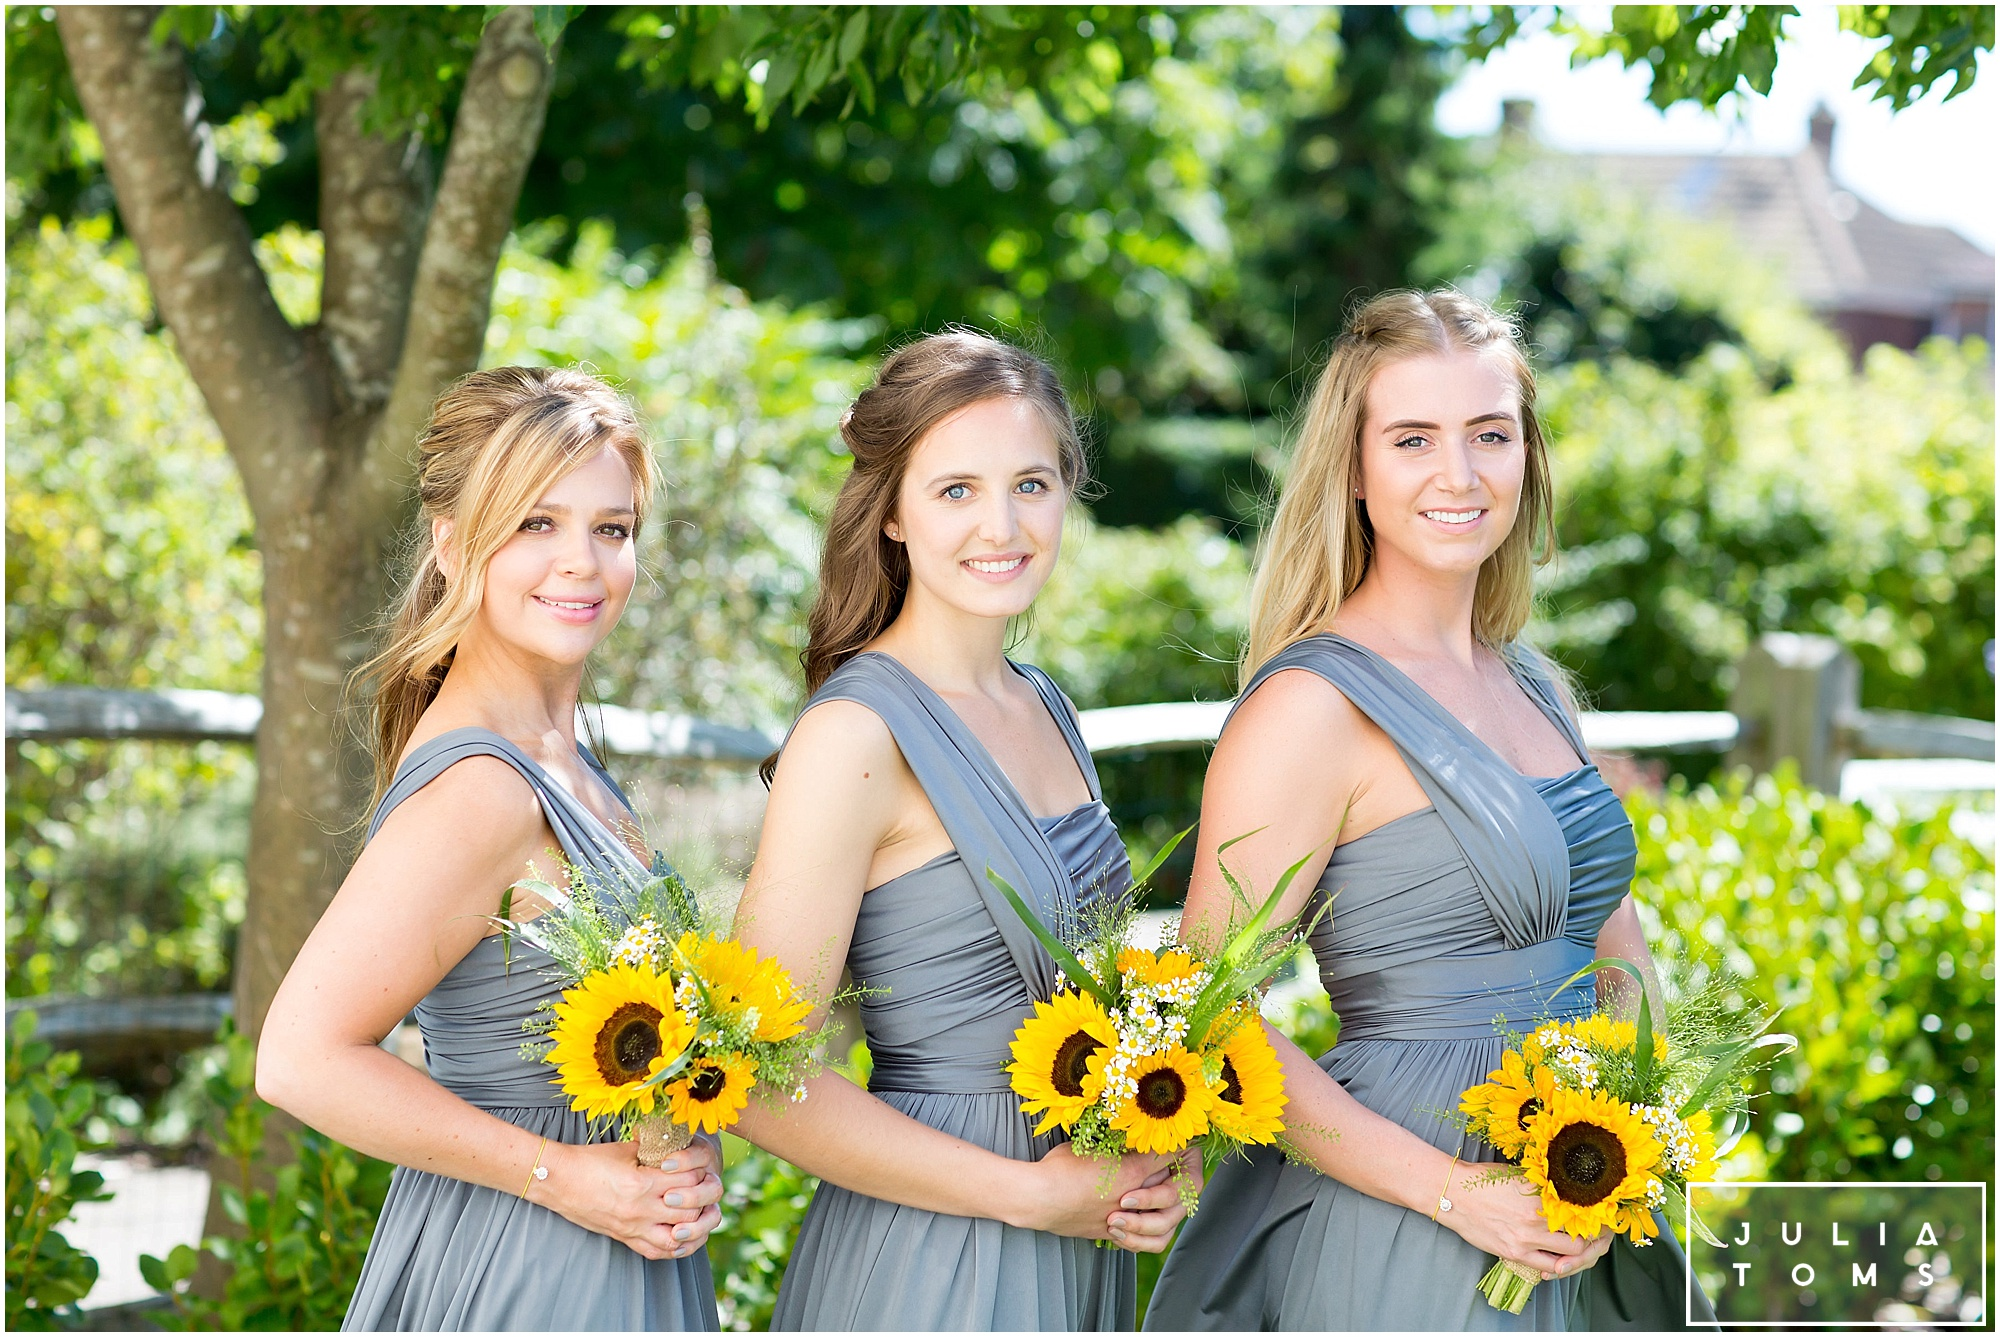 julia_toms_chichester_wedding_photographer_worthing_010.jpg